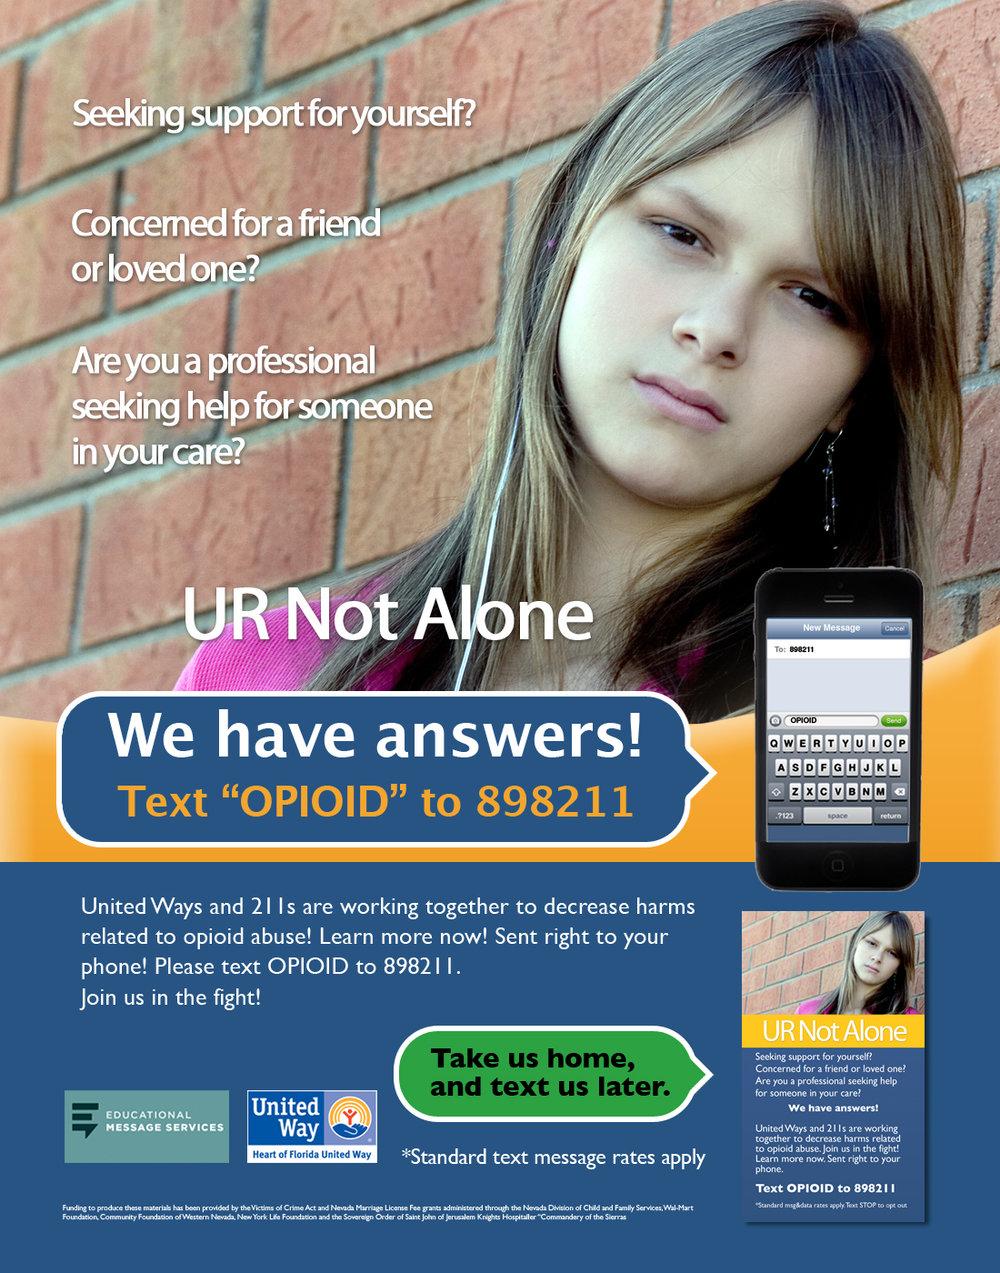 opioids_girl_poster2.jpg